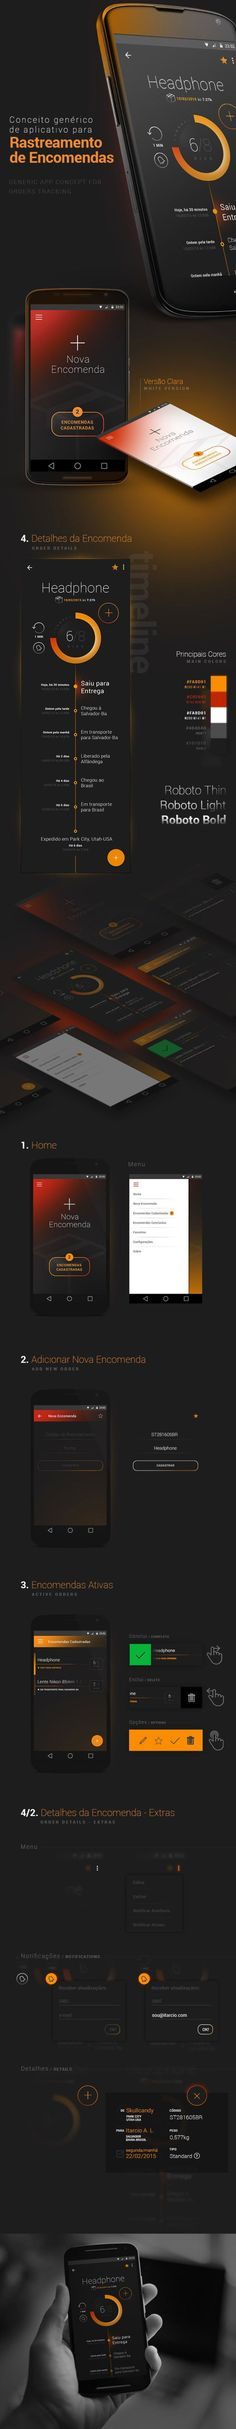 Mobile UI Design Inspiration #42 - Smashfreakz